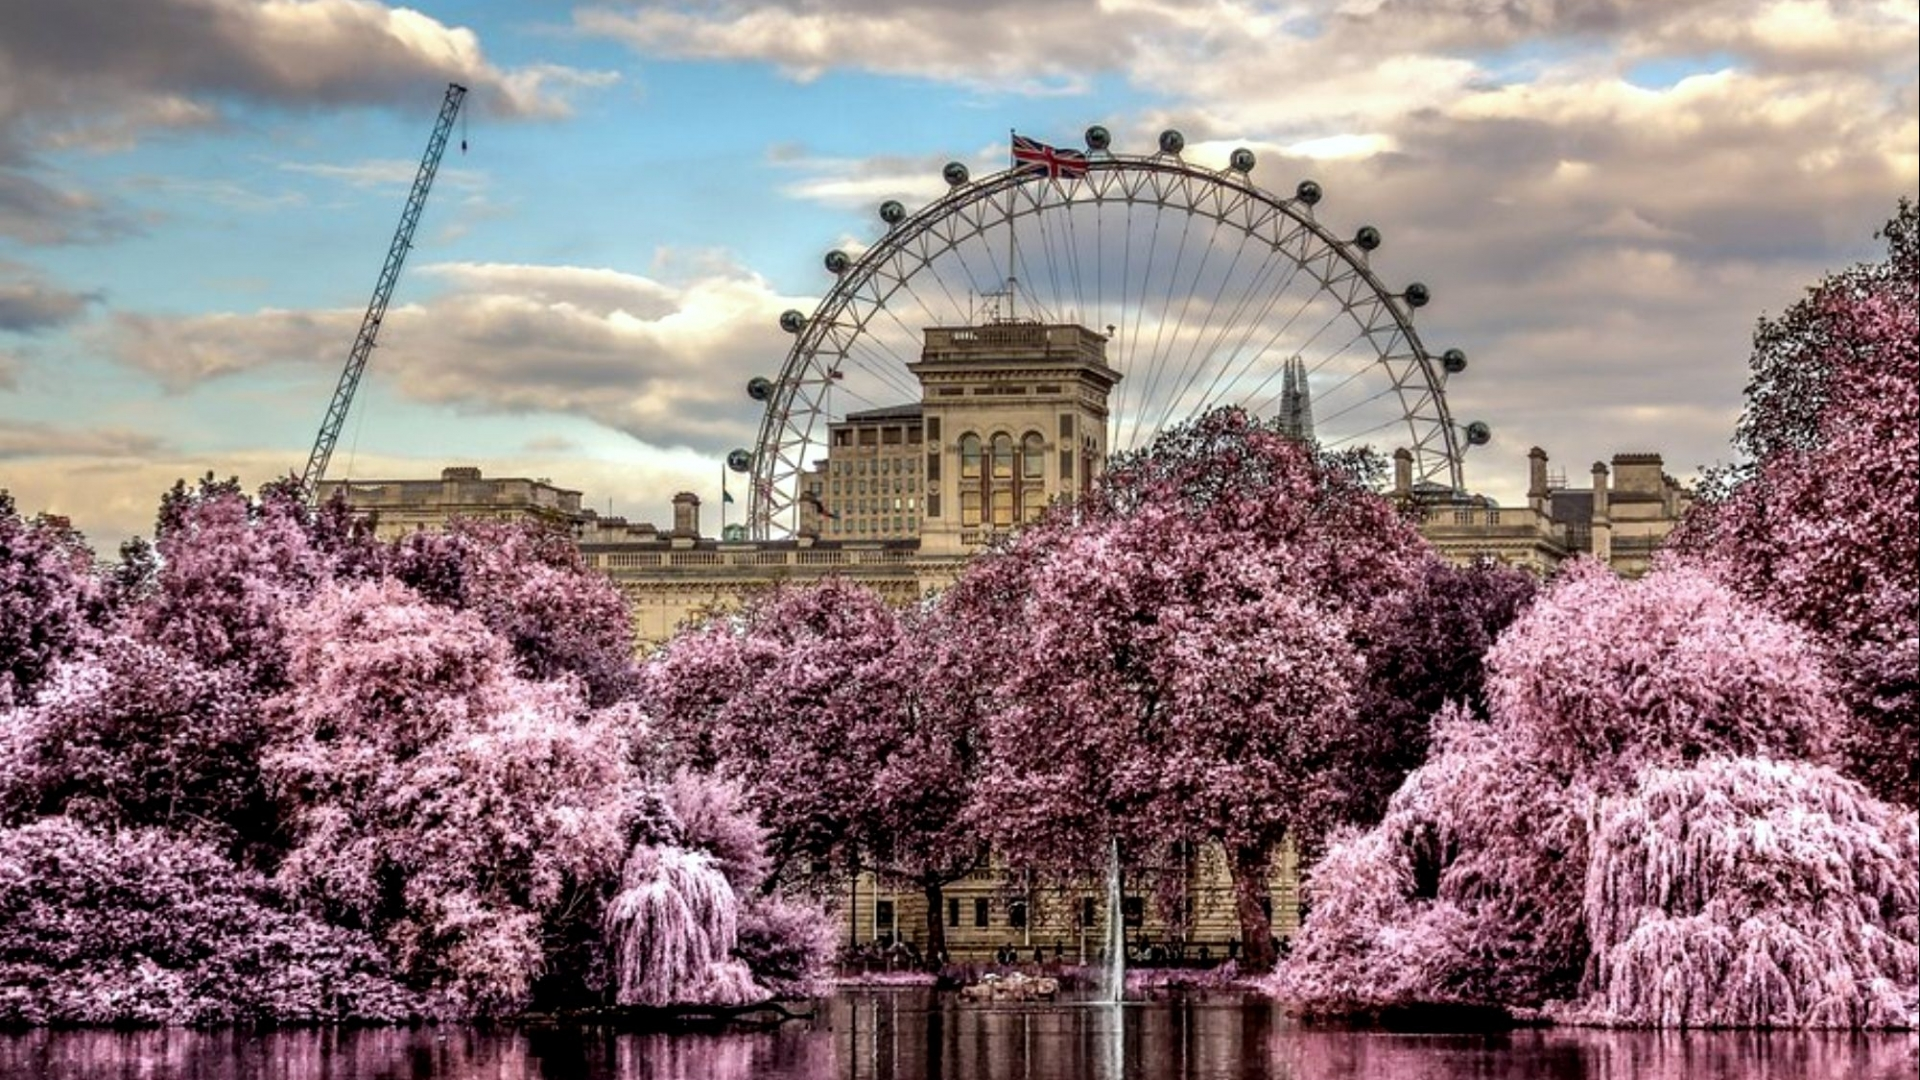 Hd wallpaper london - Garden Hd Wallpapers Best Wallpapers Fan Download Free Wallpapers